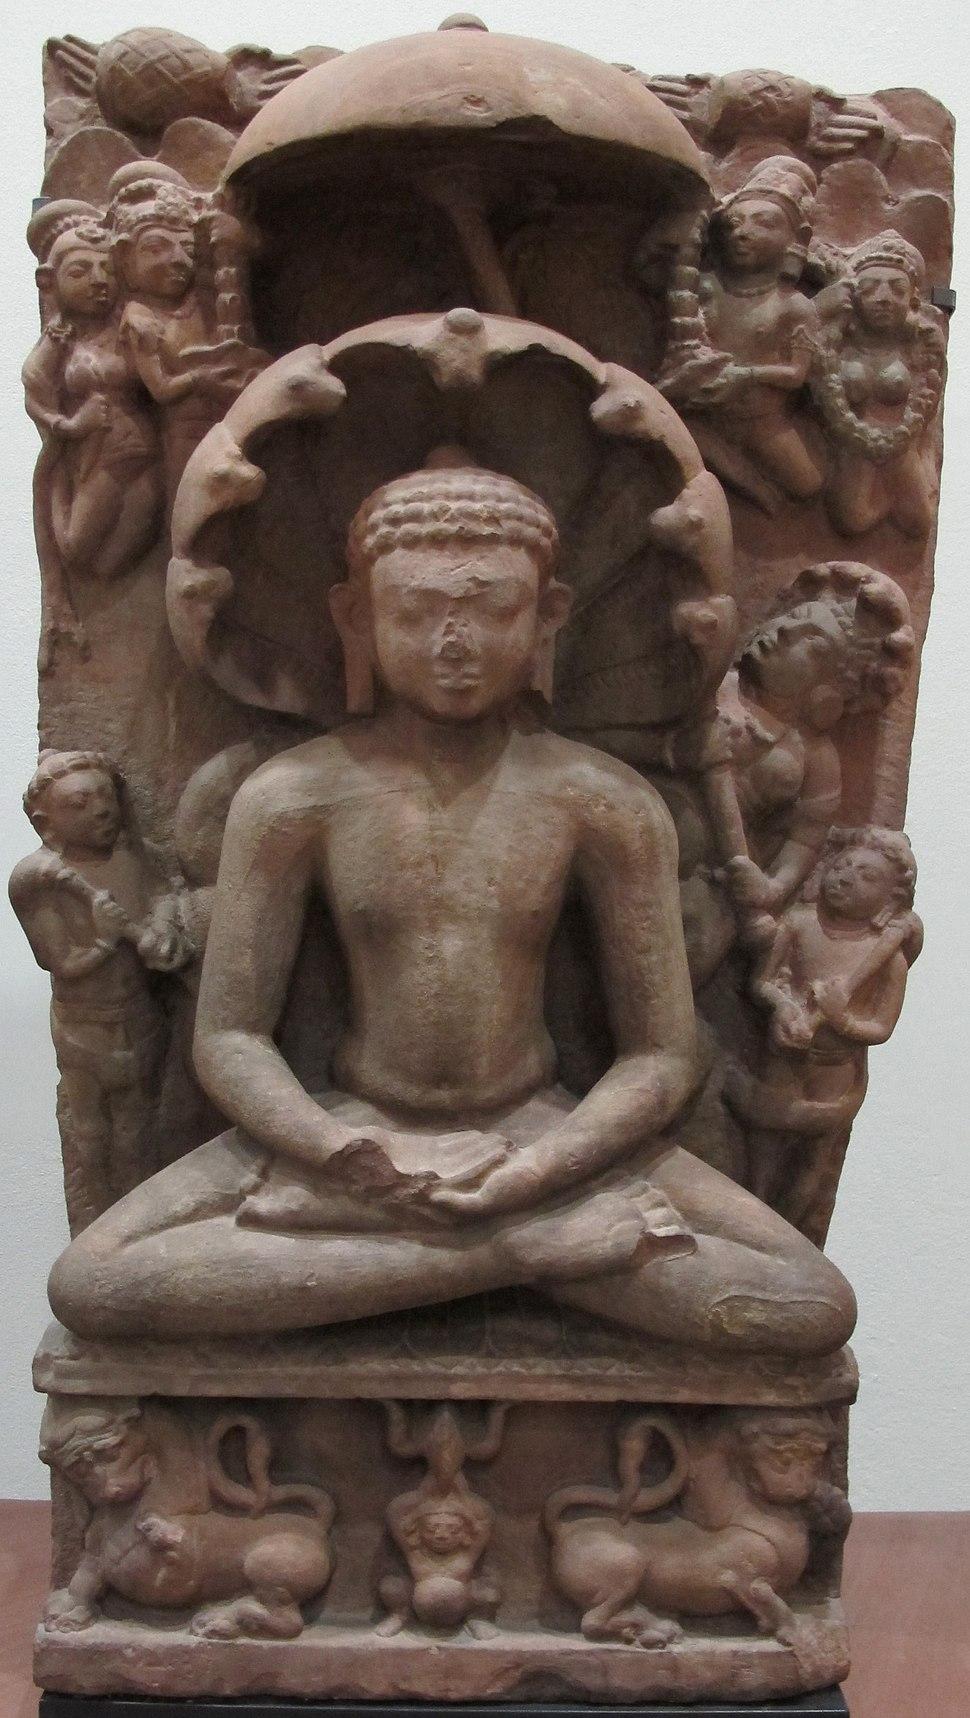 India, madhya pradesh, jina parshvanatha dalla tempèesta, 600-700